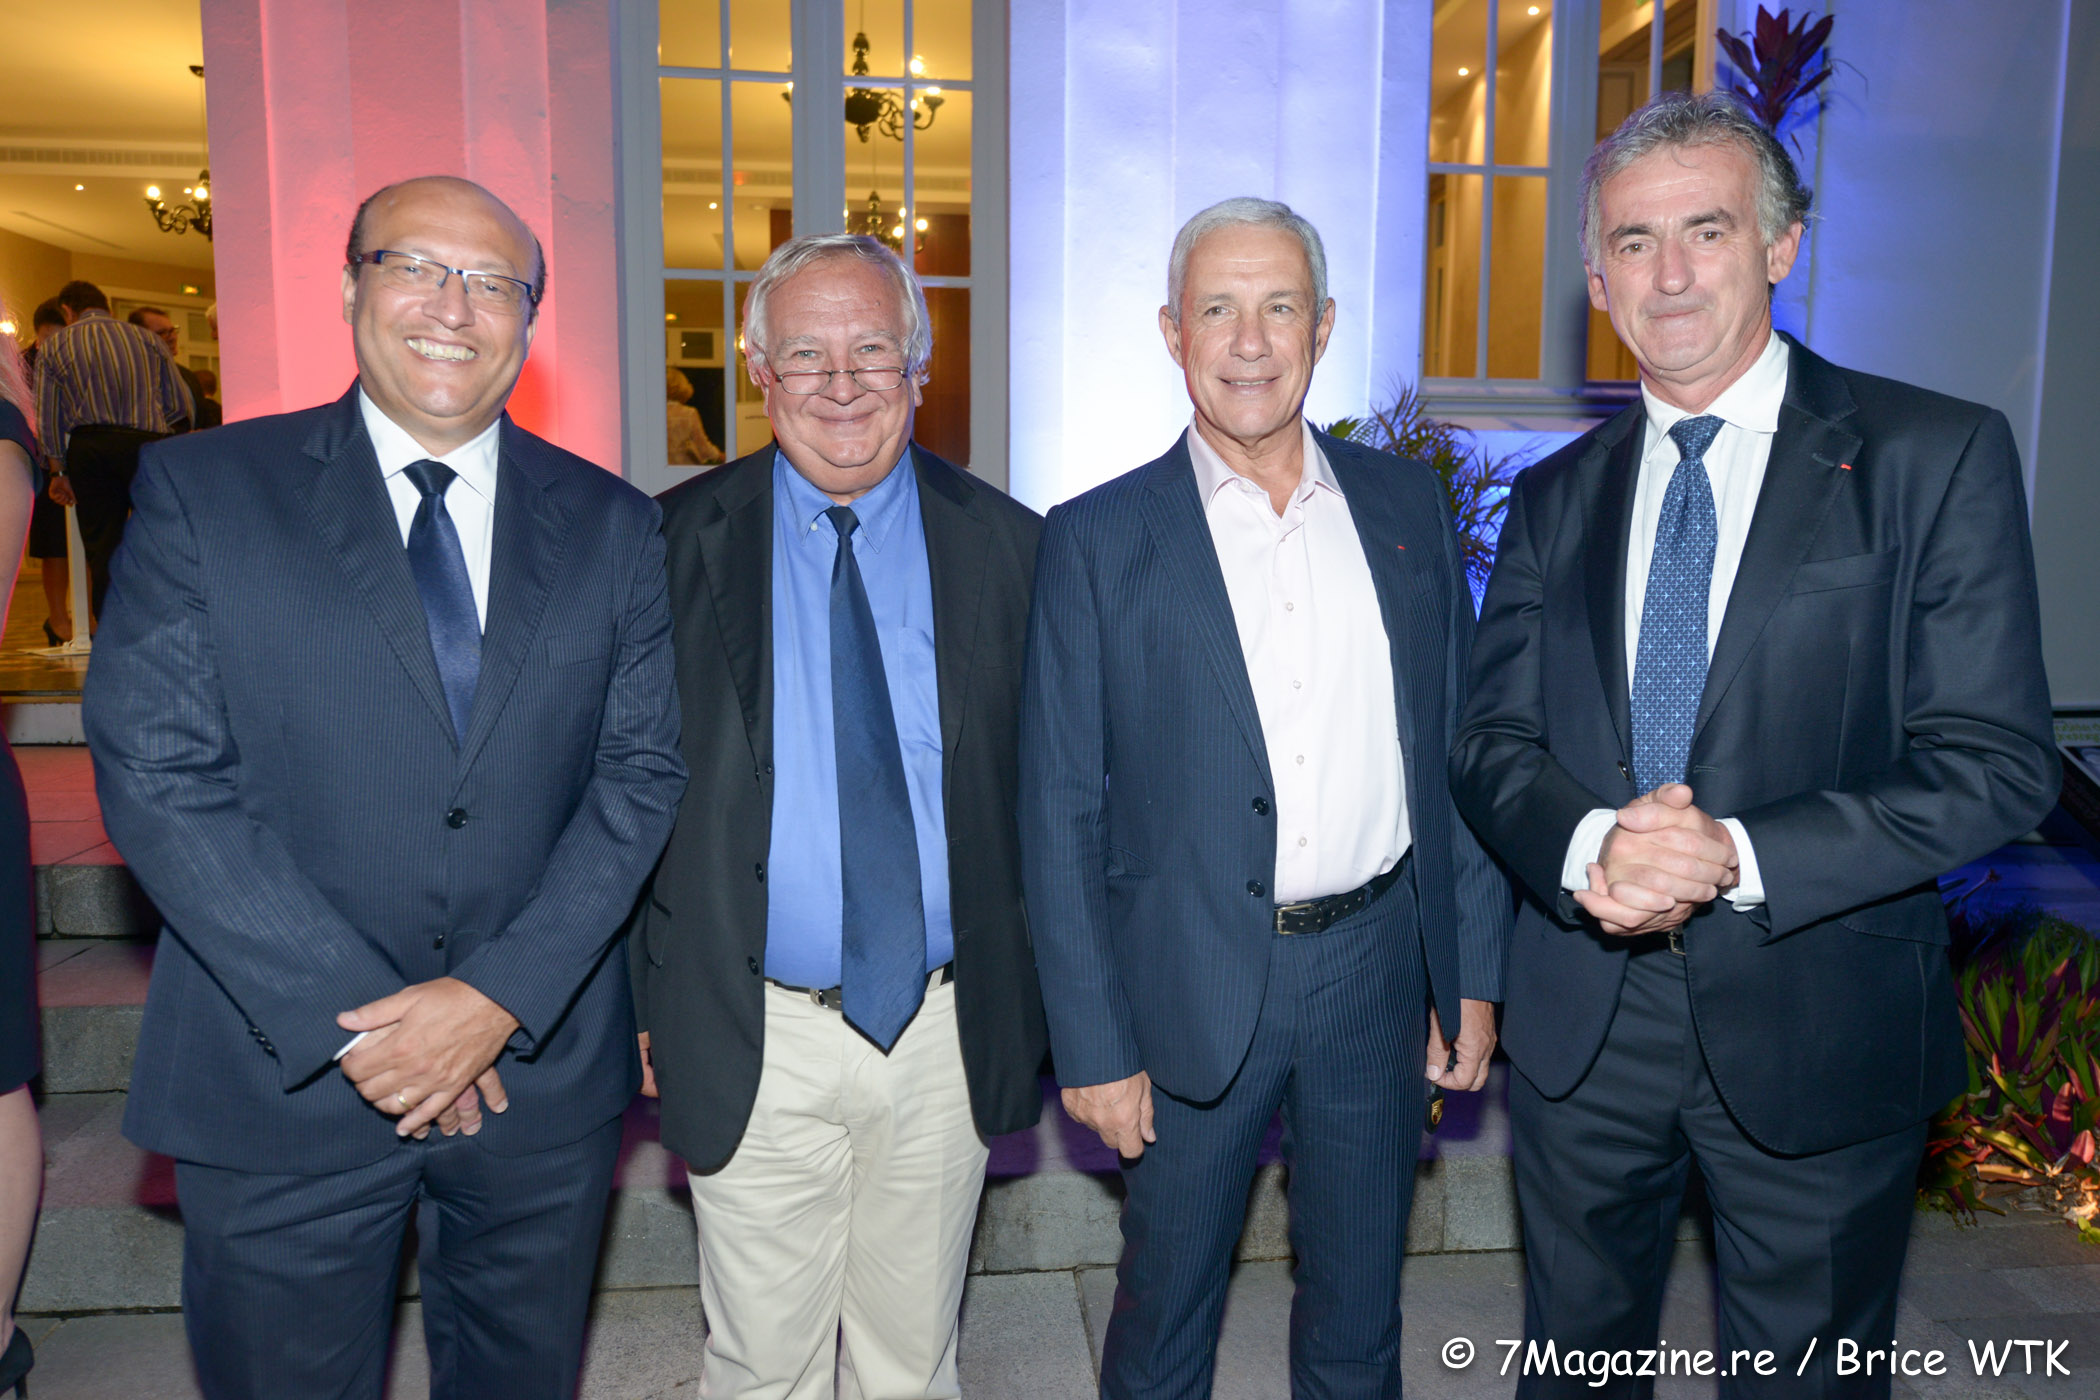 Frédéric Alory, Jean Jacques Roy, chef d'Escale Régional Océan Indien Air France, François Caillé et Frédéric Gagey